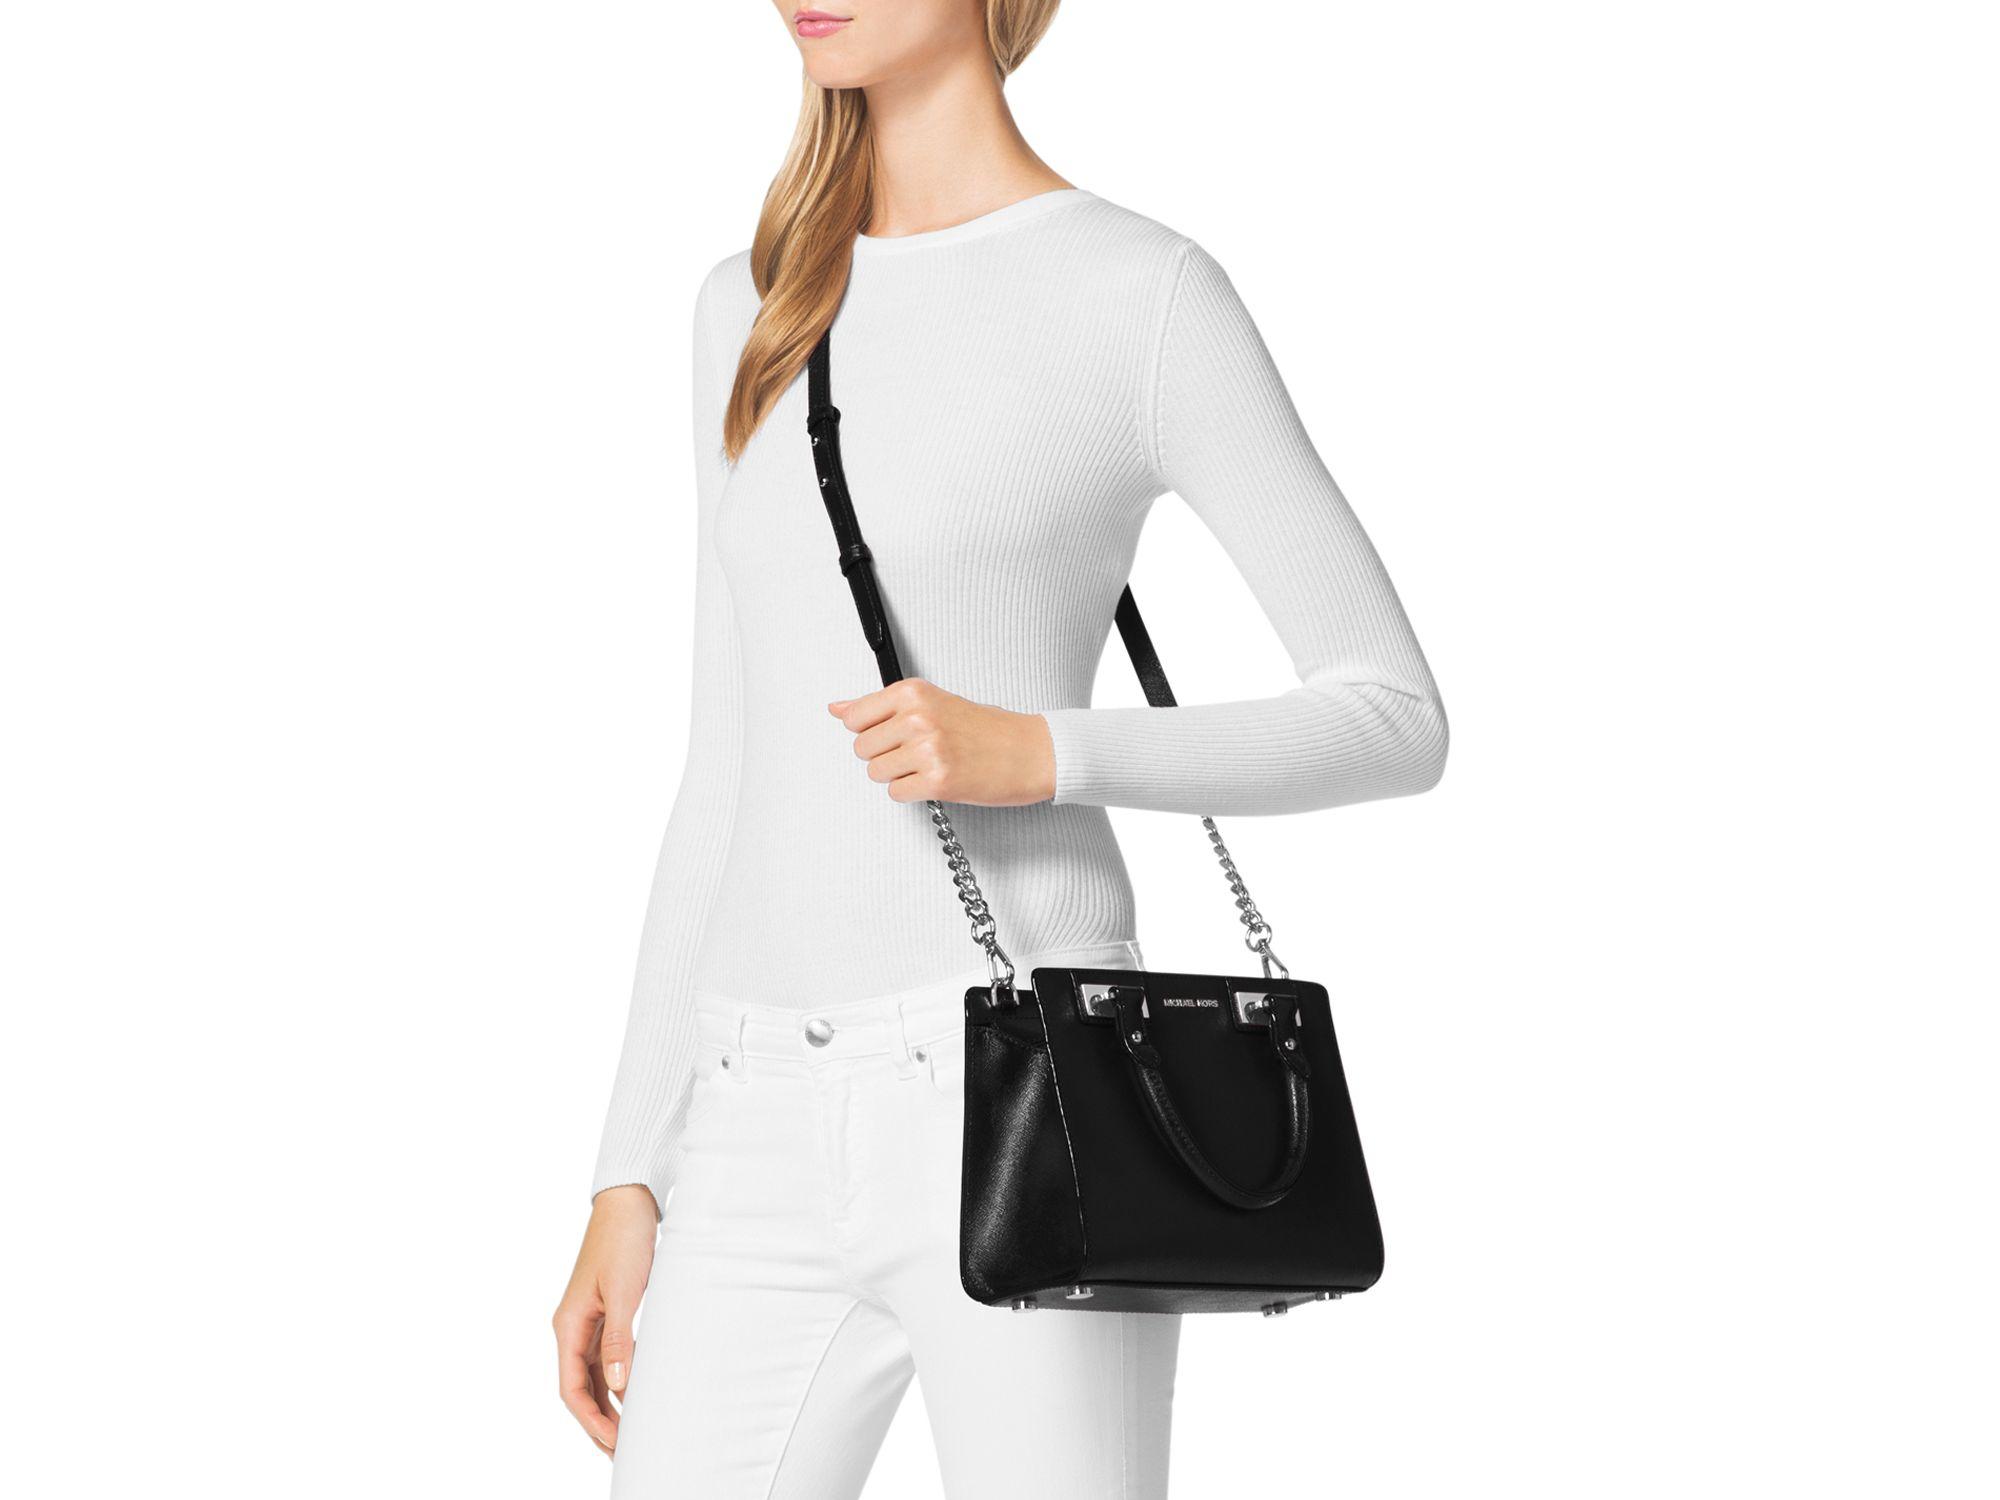 d813775bd6291 ... spain michael kors quinn small patent saffiano leather satchel in black  lyst dce90 099c6